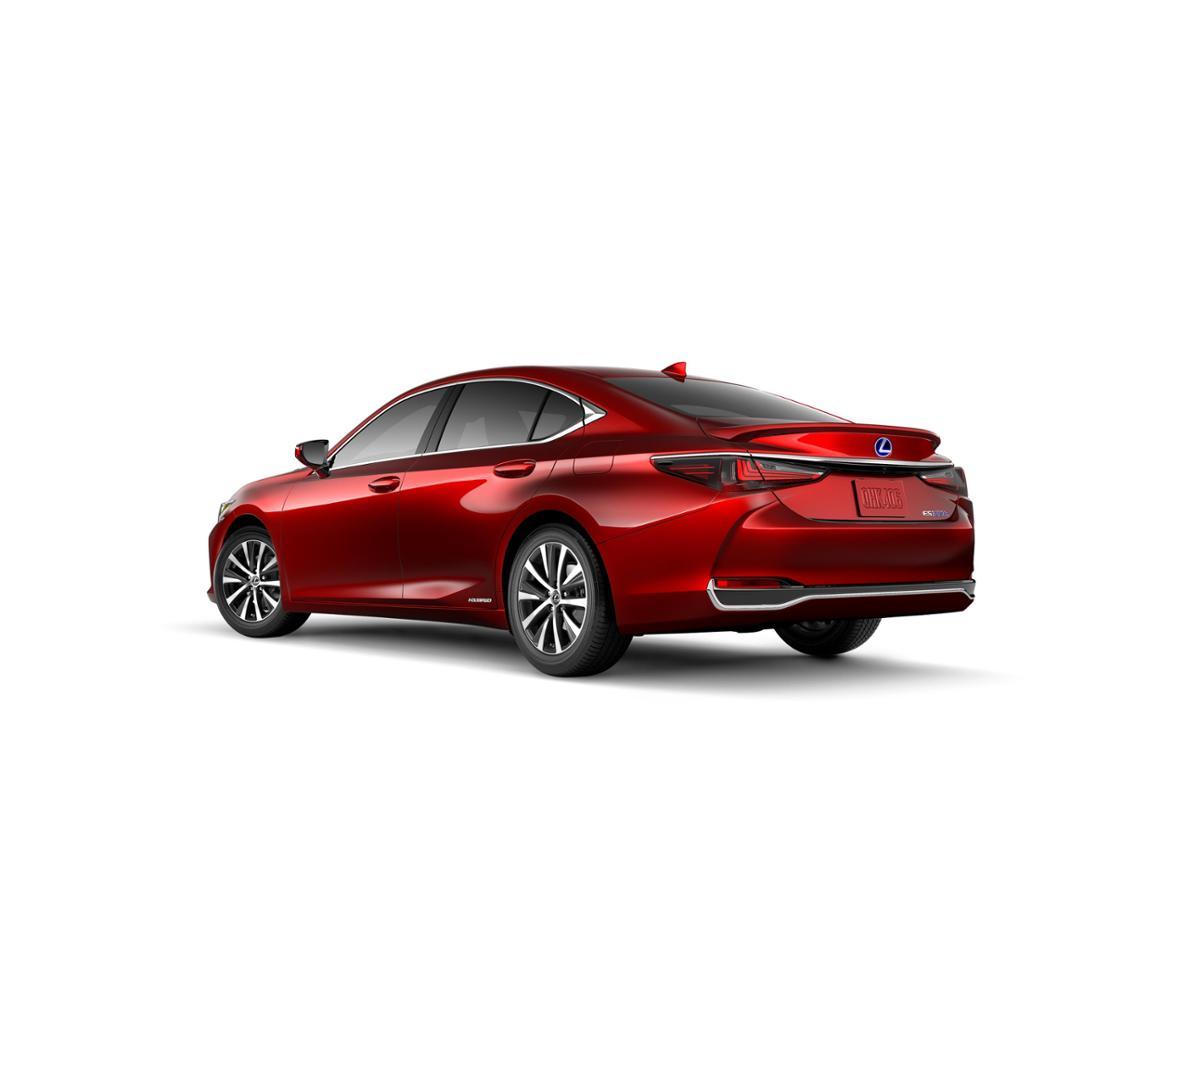 New 2019 Lexus ES 300h For Sale In Carlsbad, CA